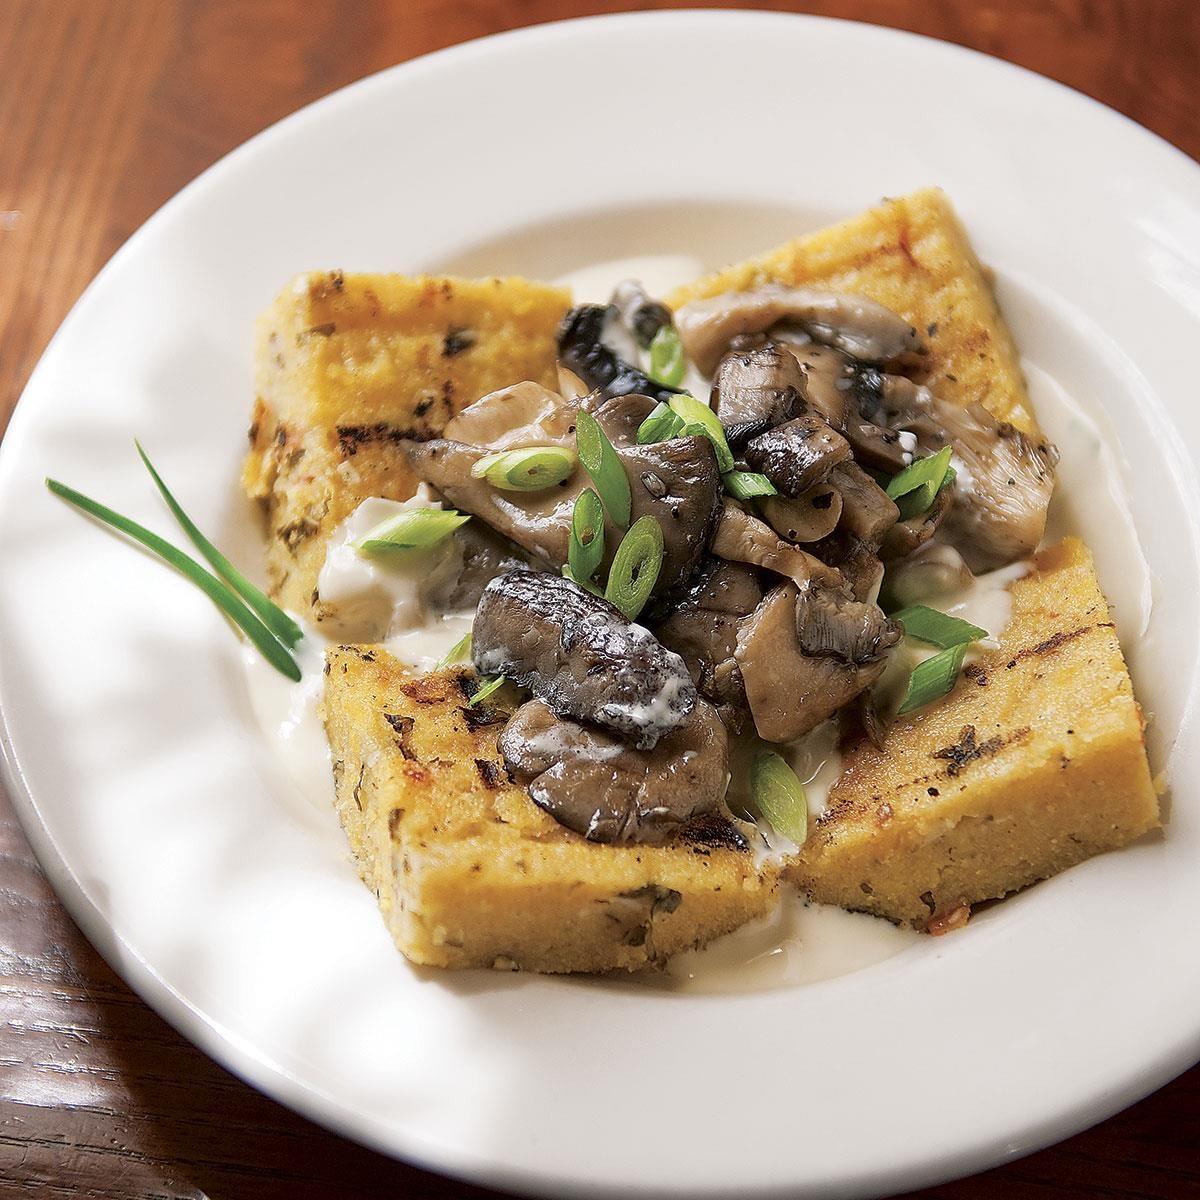 Grilled Polenta with Mushroom Sauce Recipe | Taste of Home